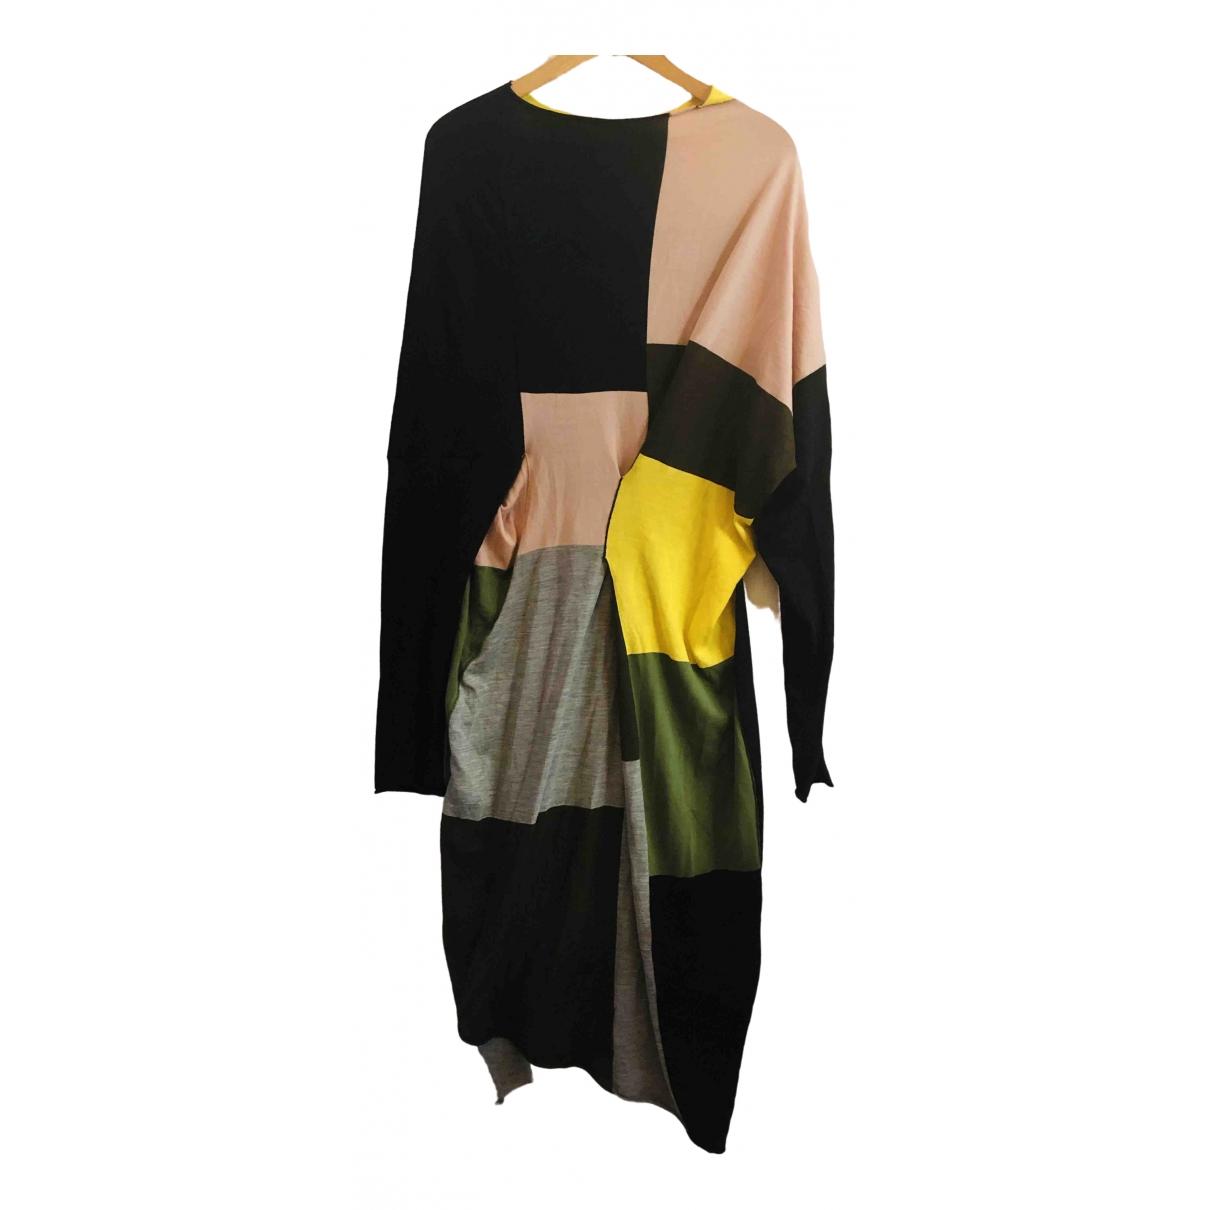 Colville \N Multicolour Wool dress for Women L International